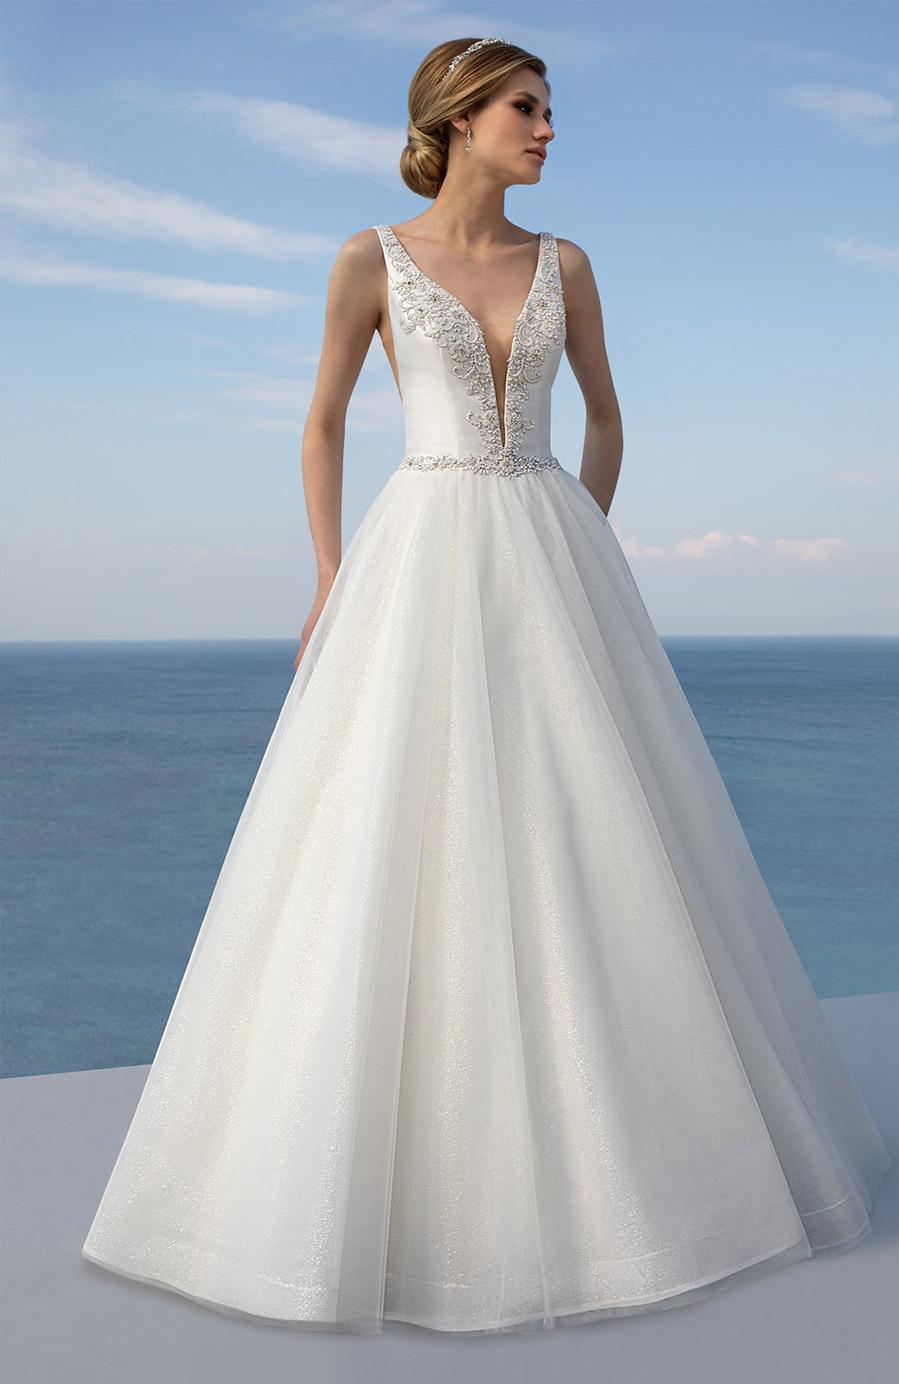 7416 Mark Lesley at Aurora Bride